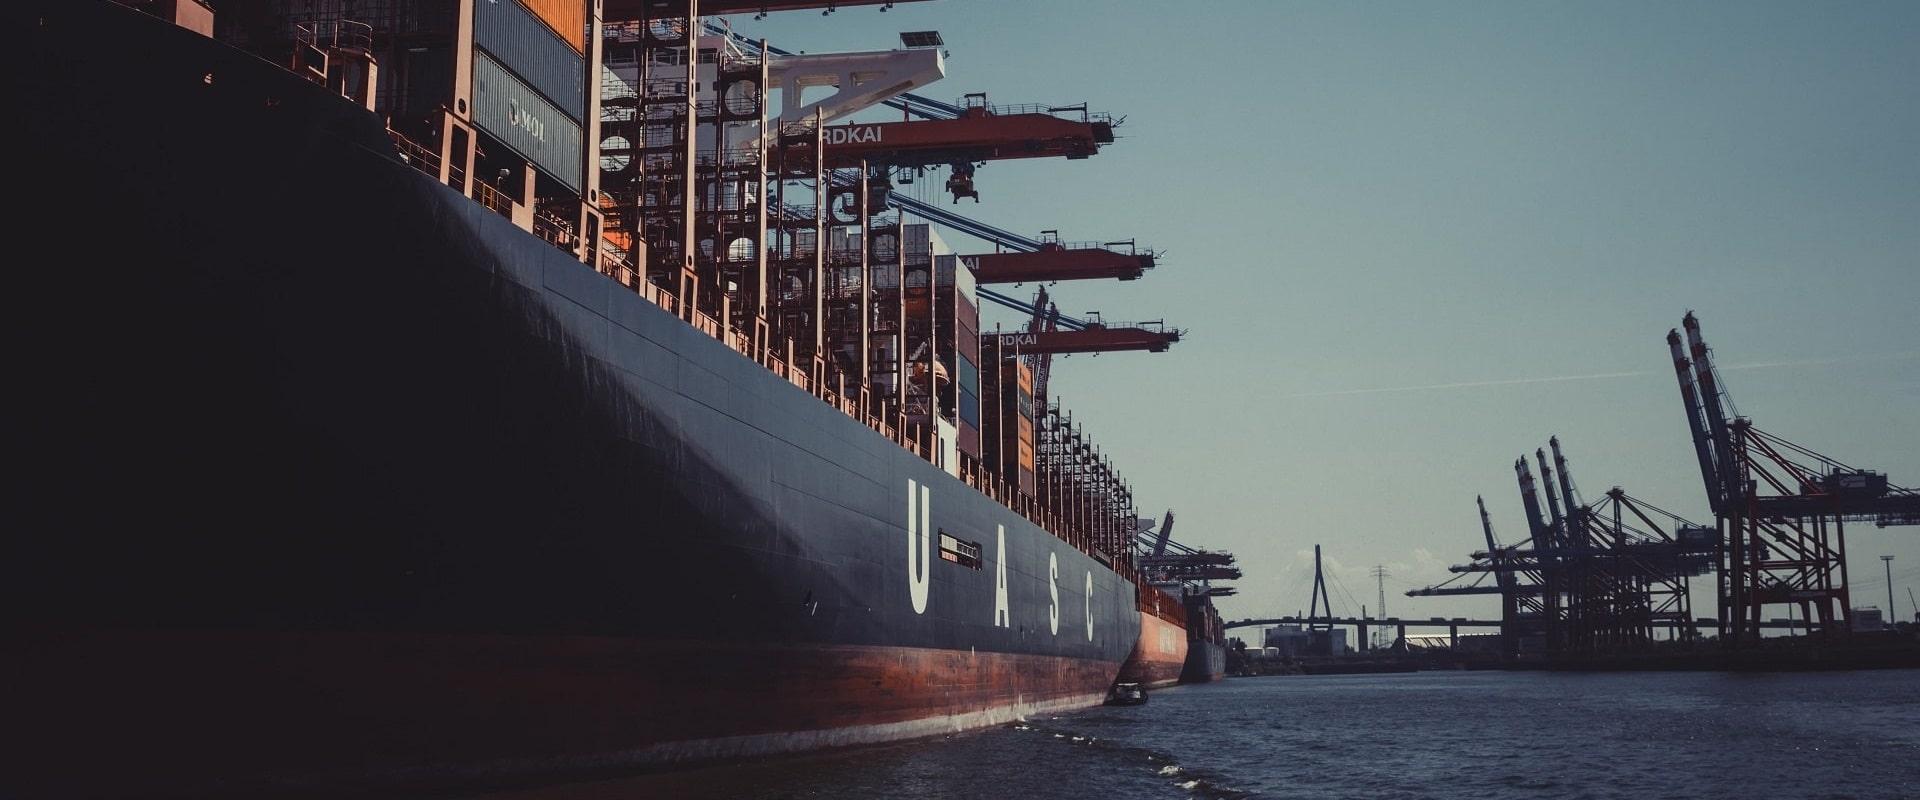 Contact Us - Marine Engineering Company in UAE